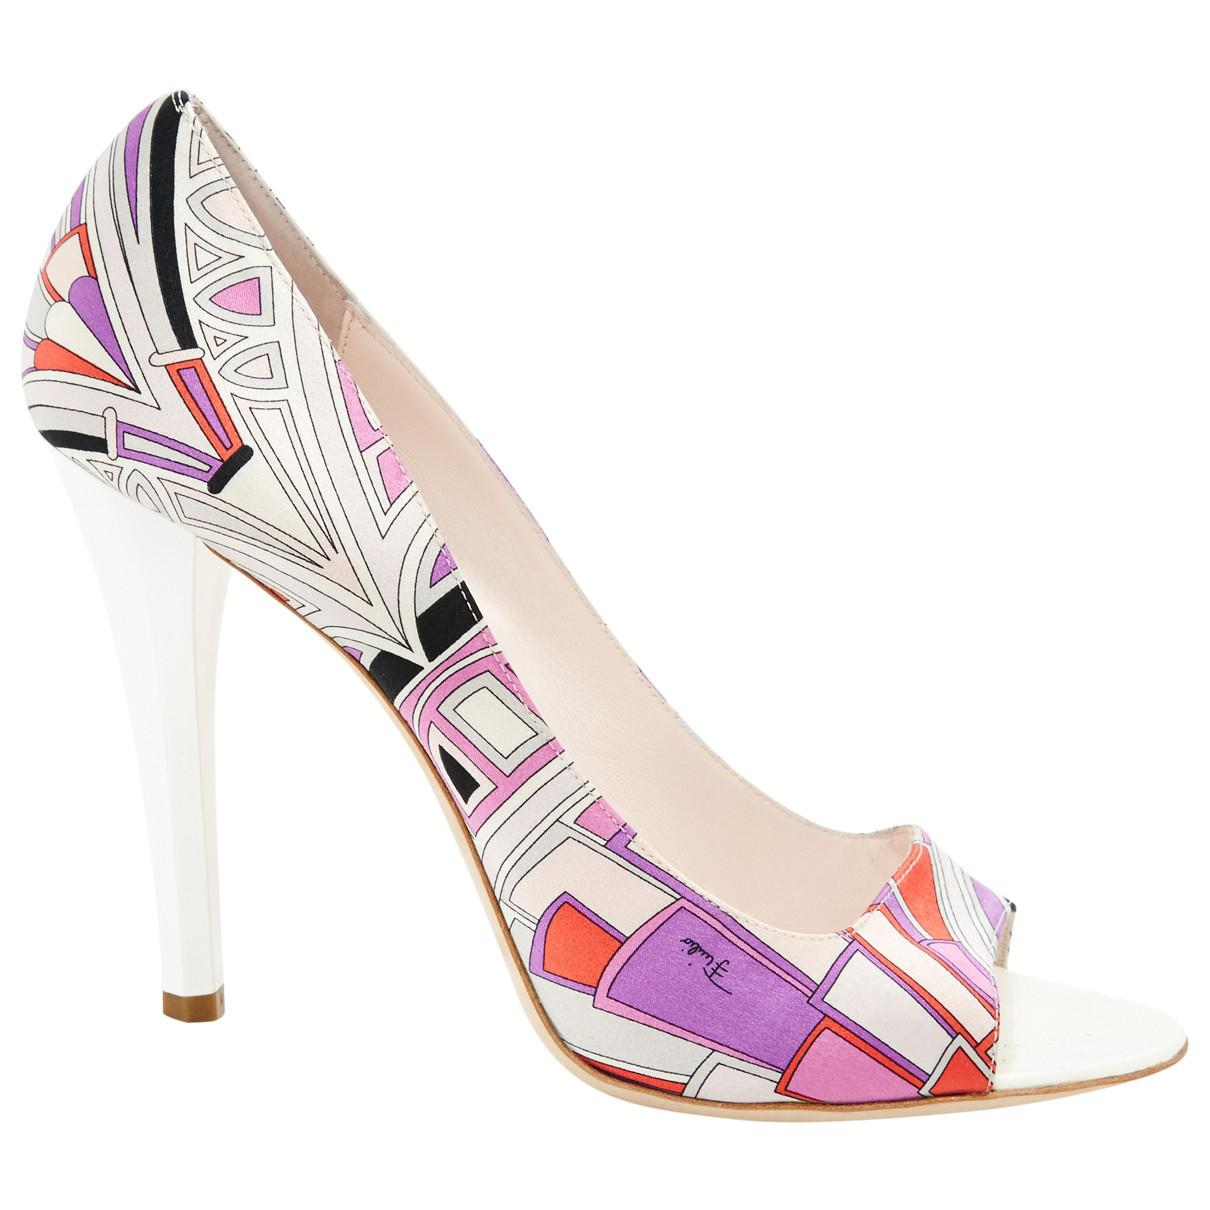 Pre-owned - Multicolour Heels Emilio Pucci oDJ85